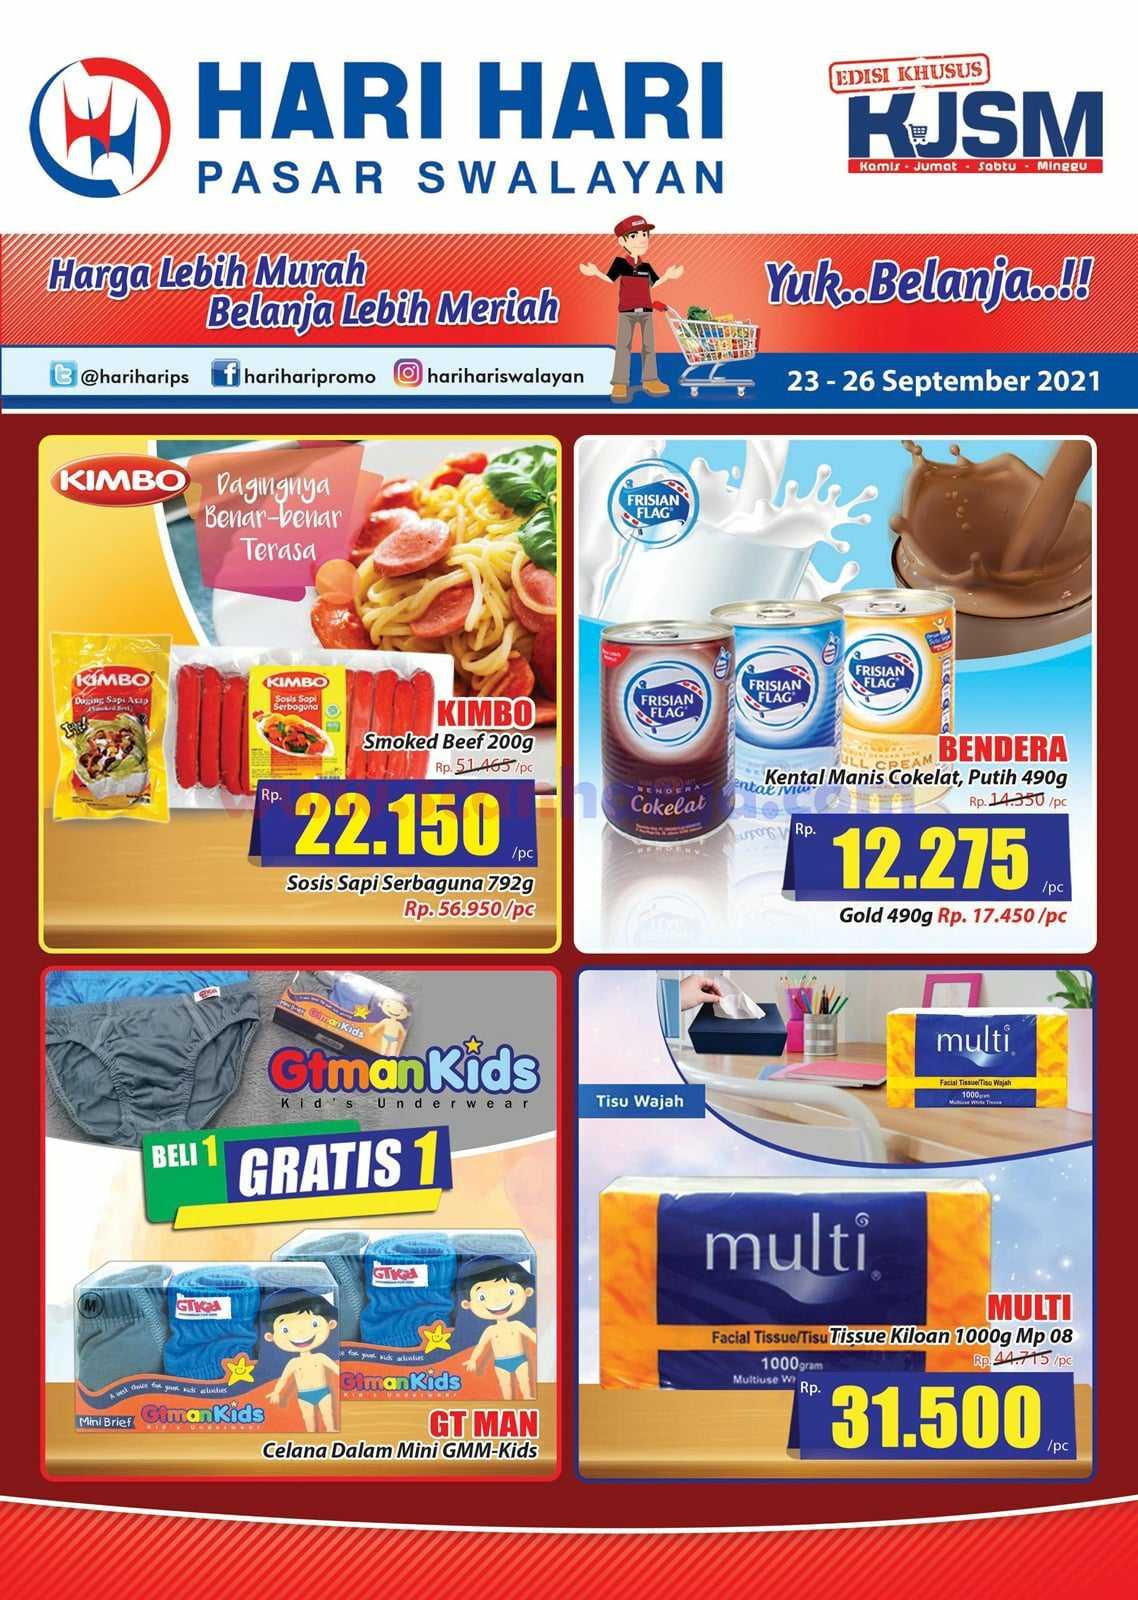 Katalog Promo JSM Hari Hari Swalayan Weekend 23 - 26 September 2021 1